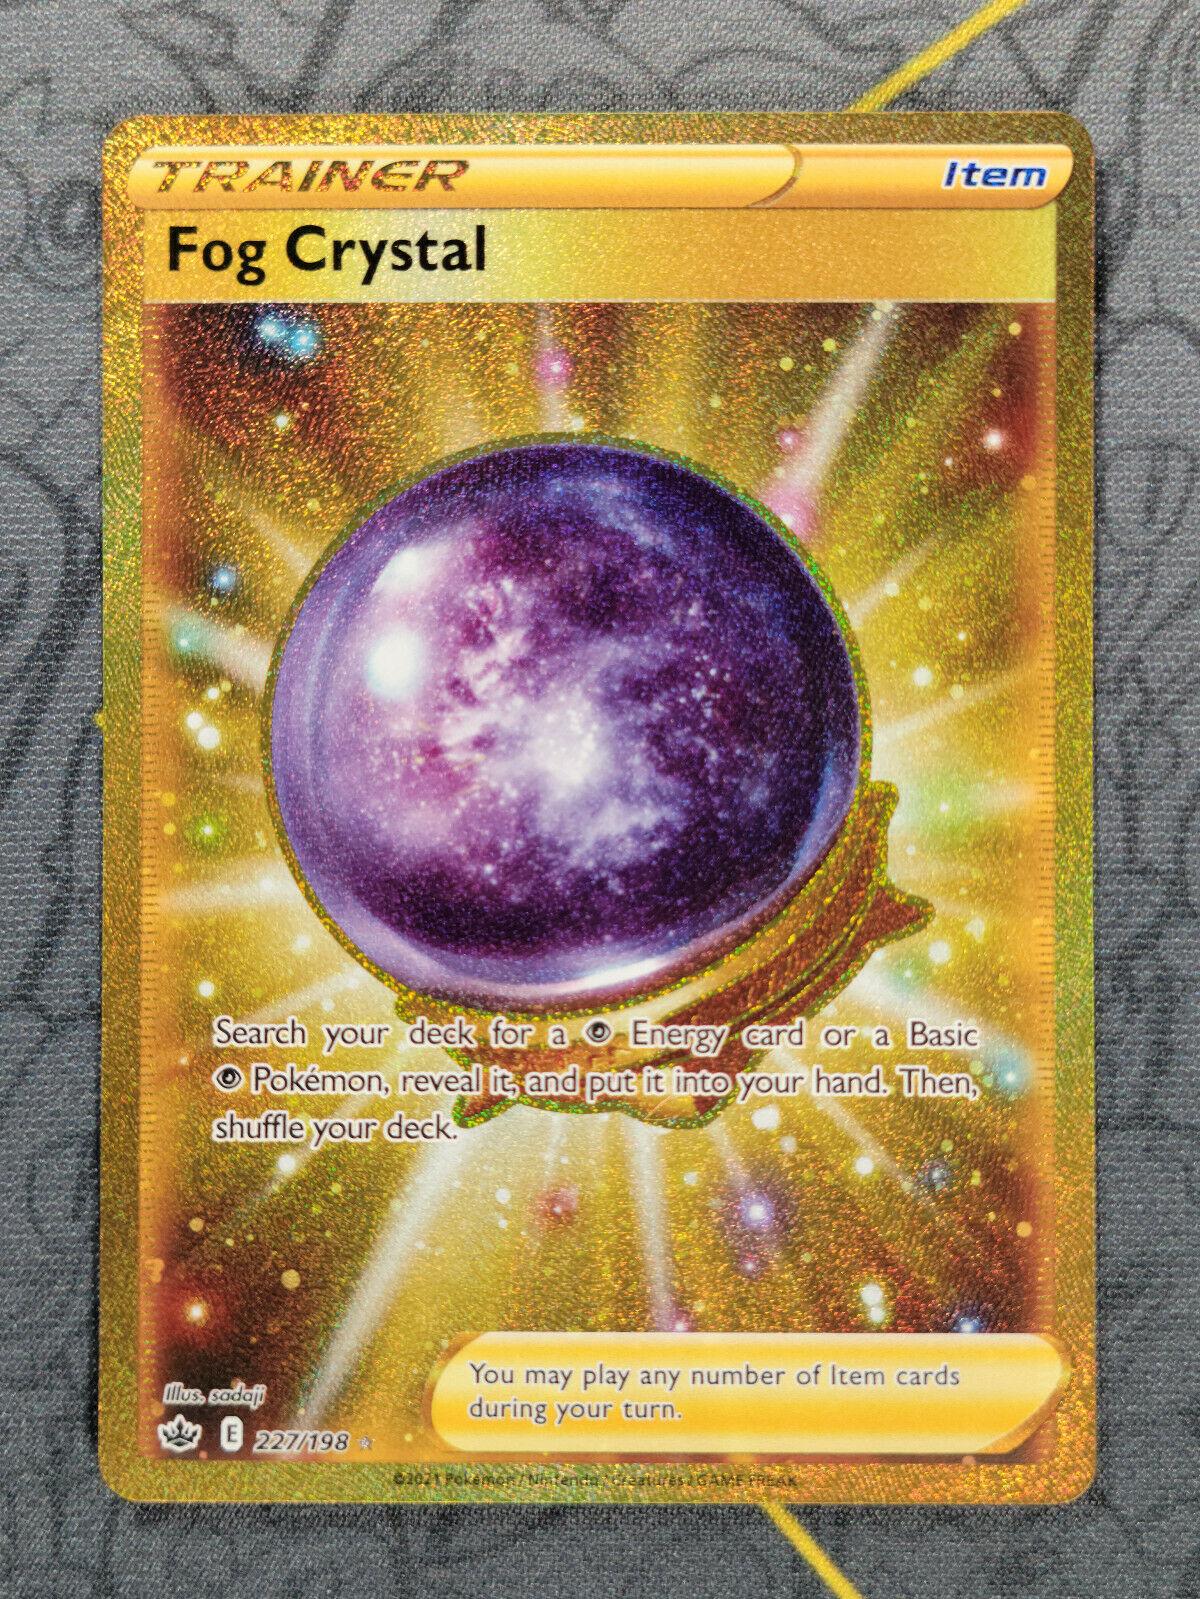 Fog Crystal 227/198 Gold Rare Chilling Reign Pokemon Card Mint/Near Mint